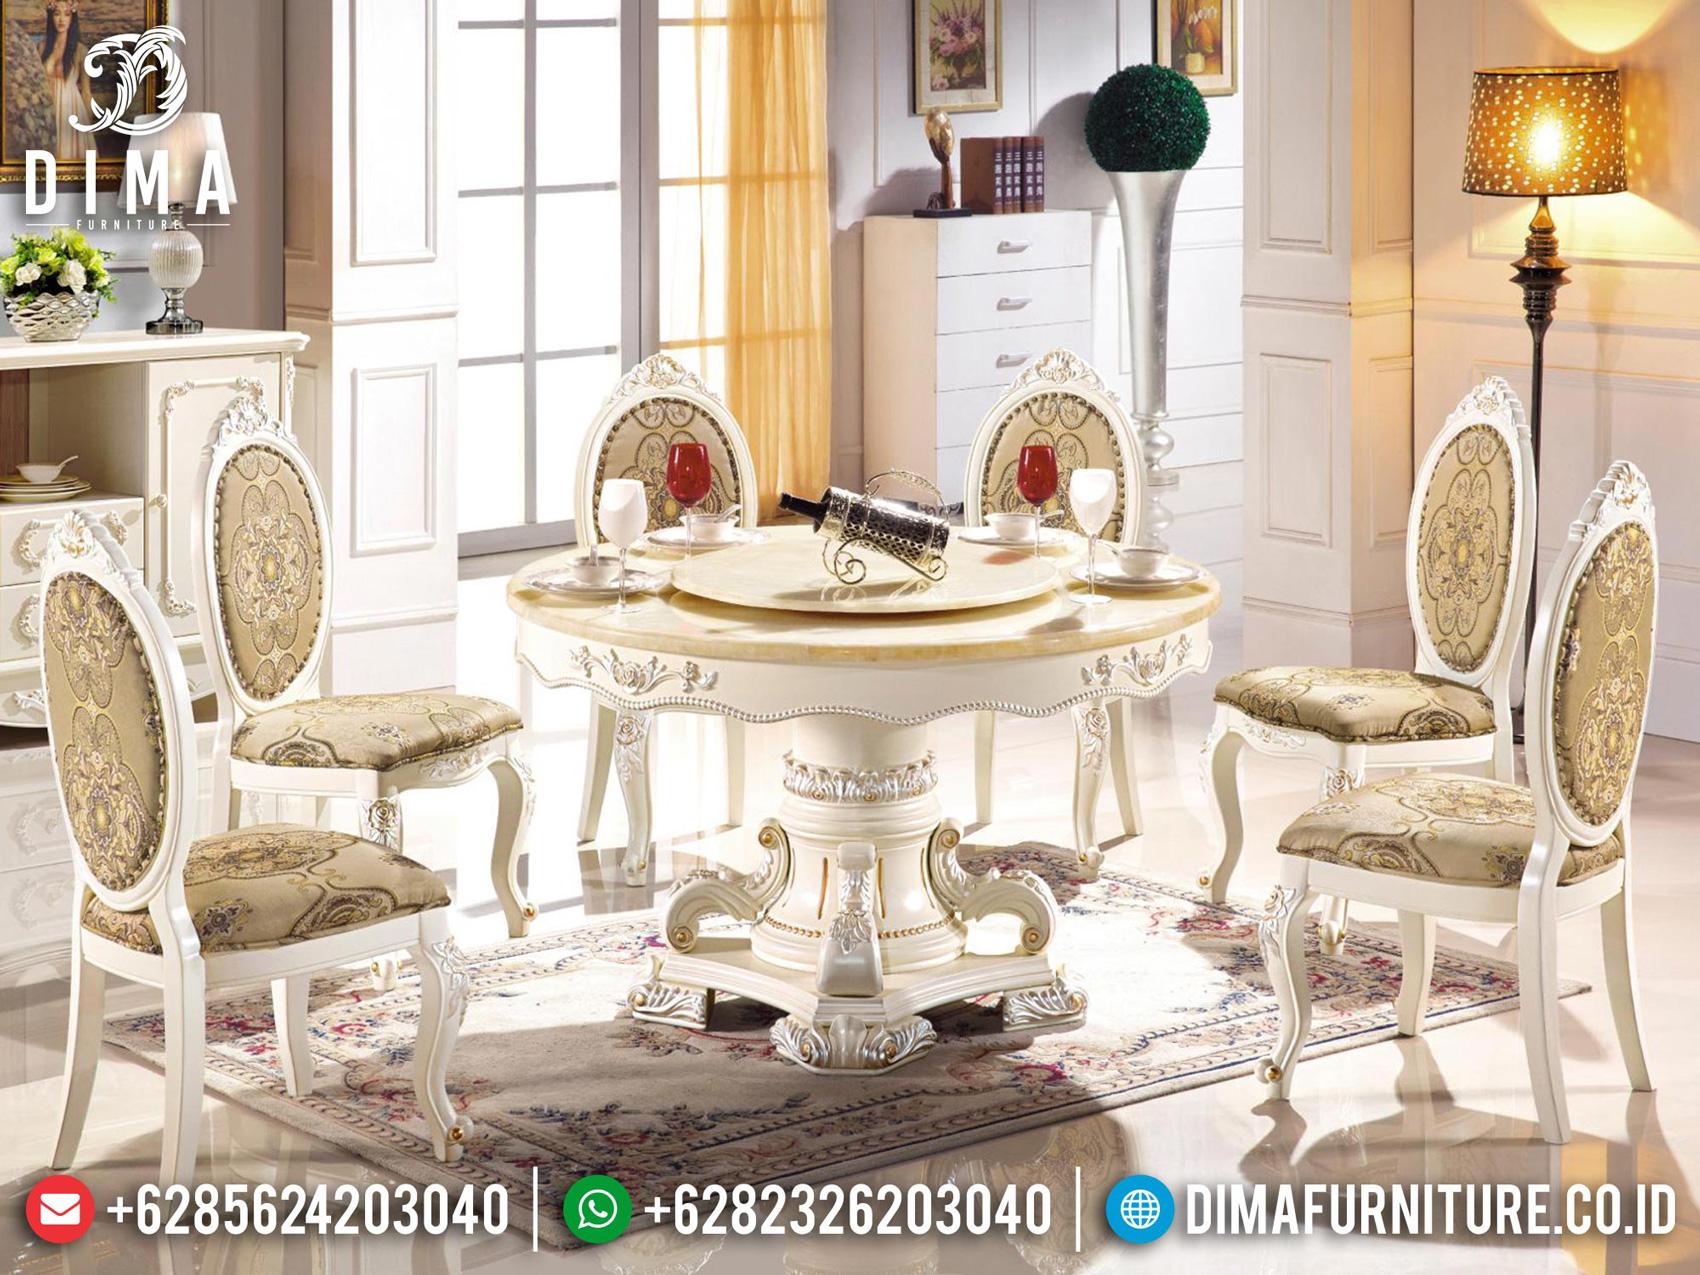 Meja Makan Mewah Klasik Jepara Glamorous Set Luxury Model Carving Mm-1018